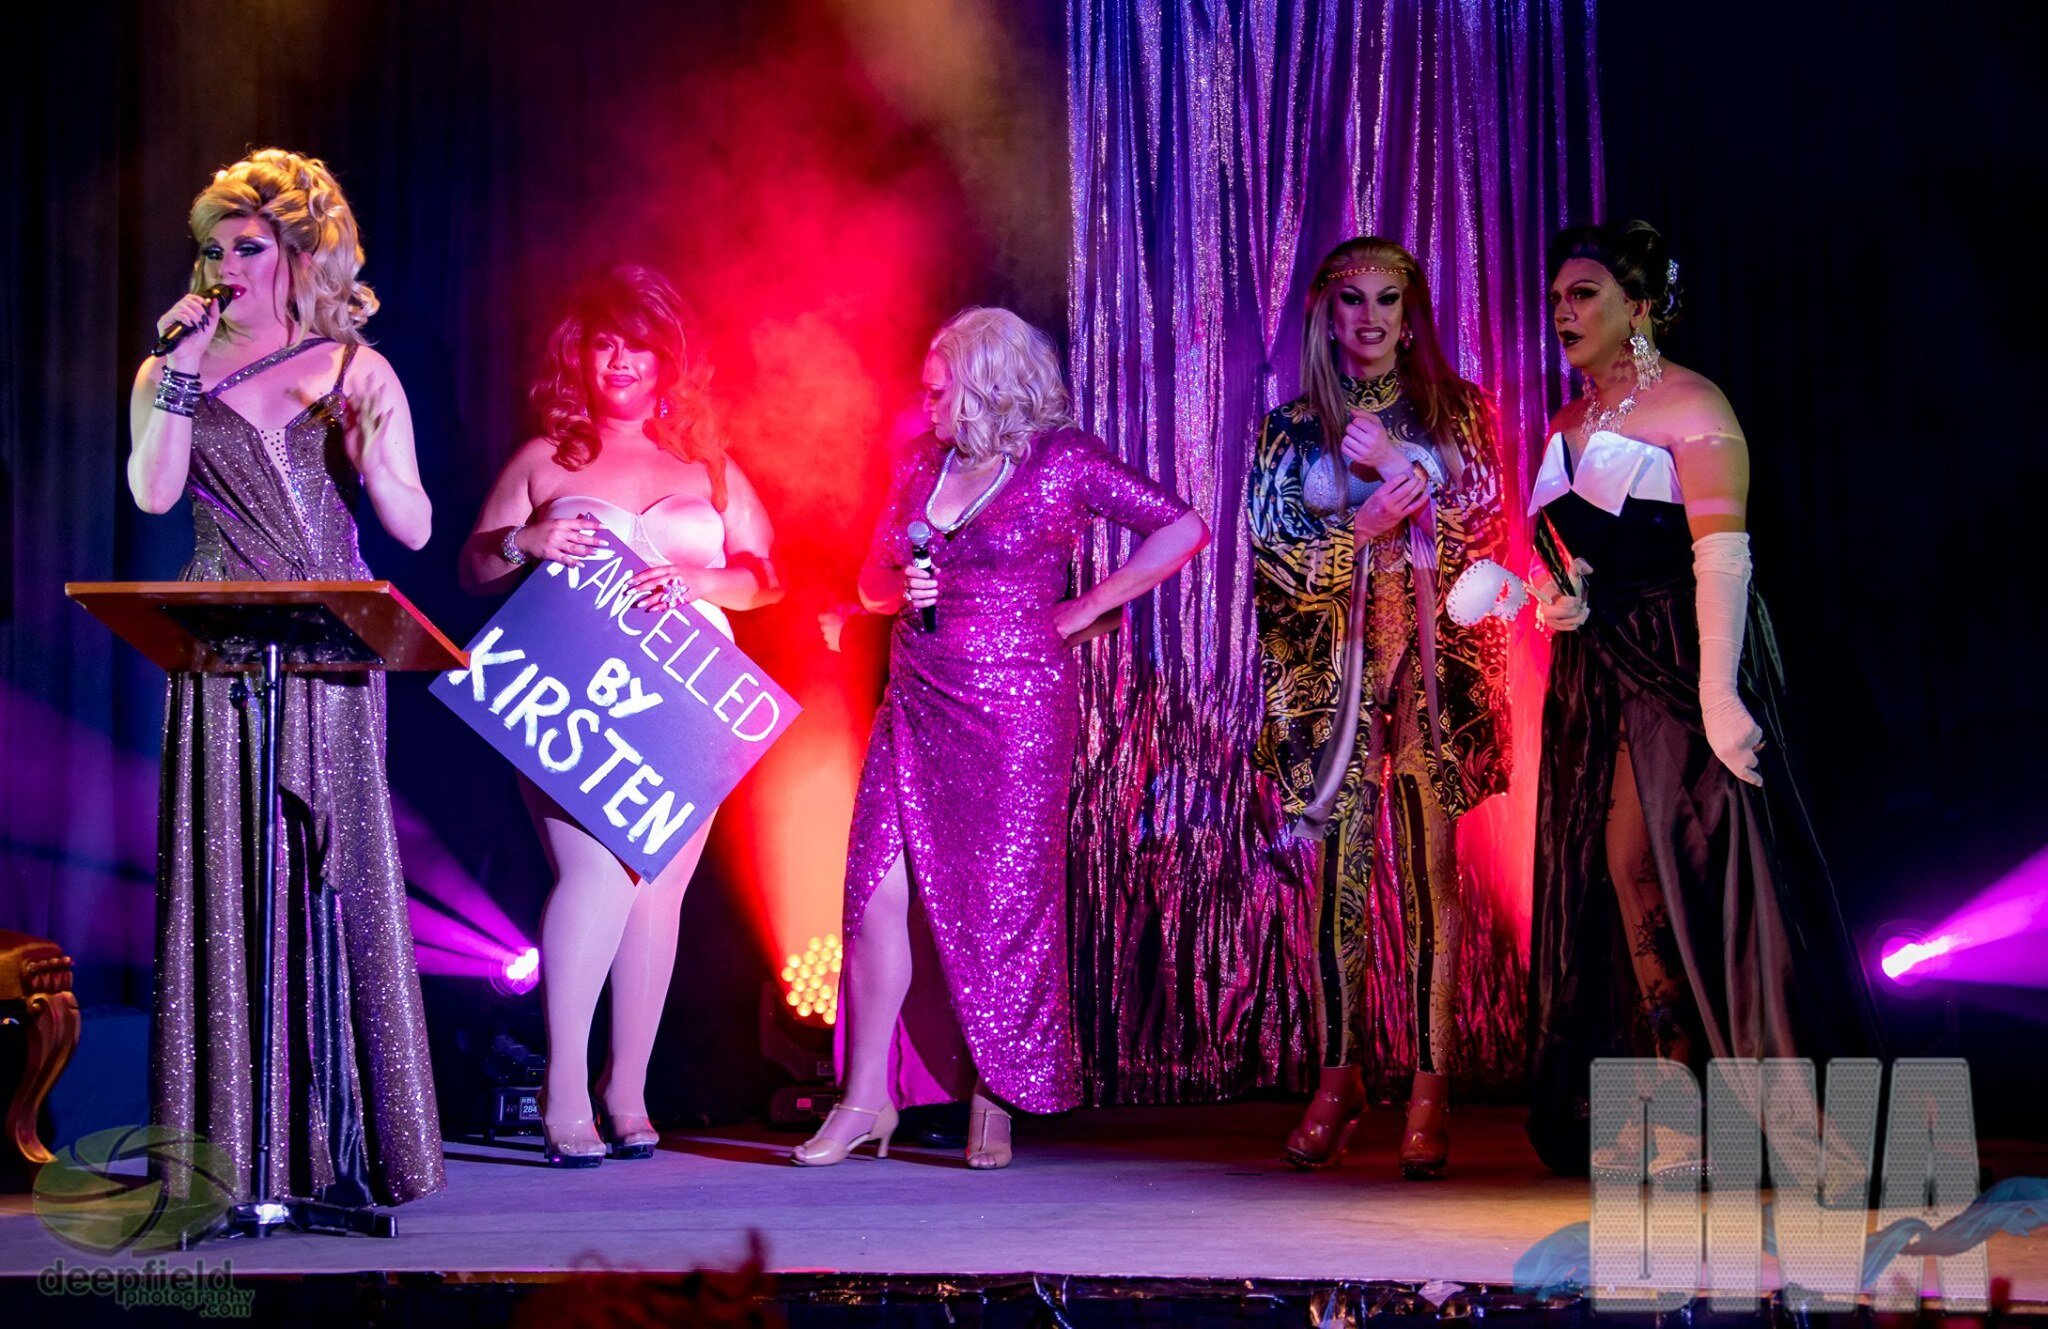 masqueerade-winner-show-of-the-year-charisma-belle-win-diva-awards-sydney-drag-queen-royalty-best-hire-drag-race-australia.jpg